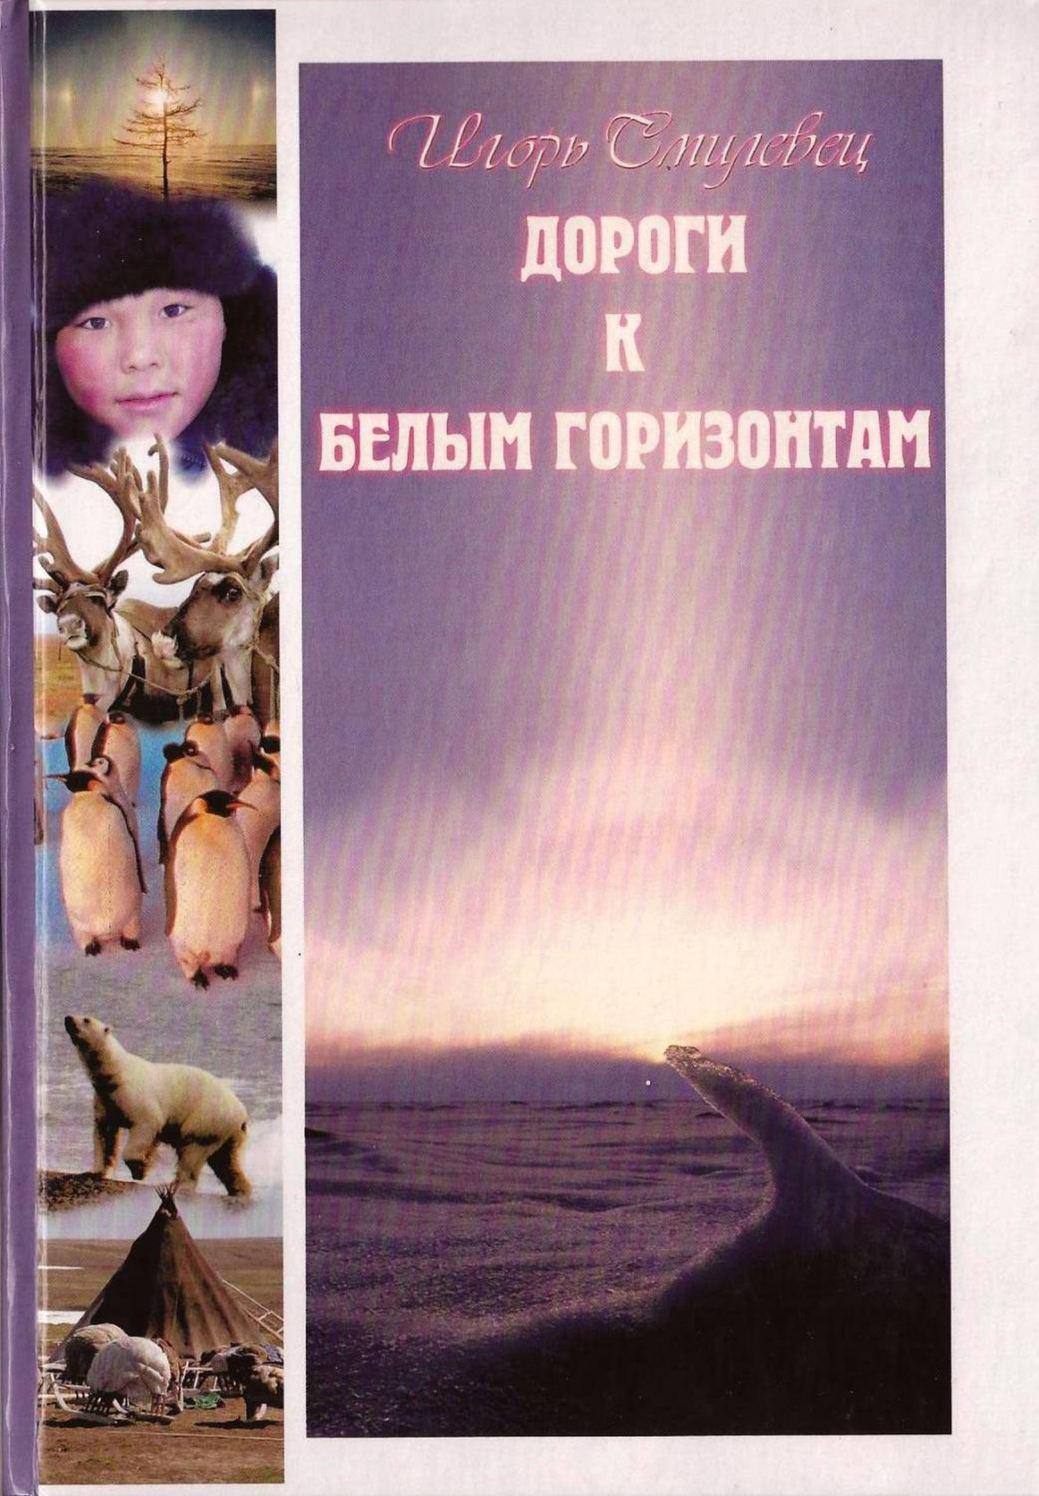 trahnul-spyashuyu-dokumentalnoe-video-seks-chugunnoy-afrikanki-rolik